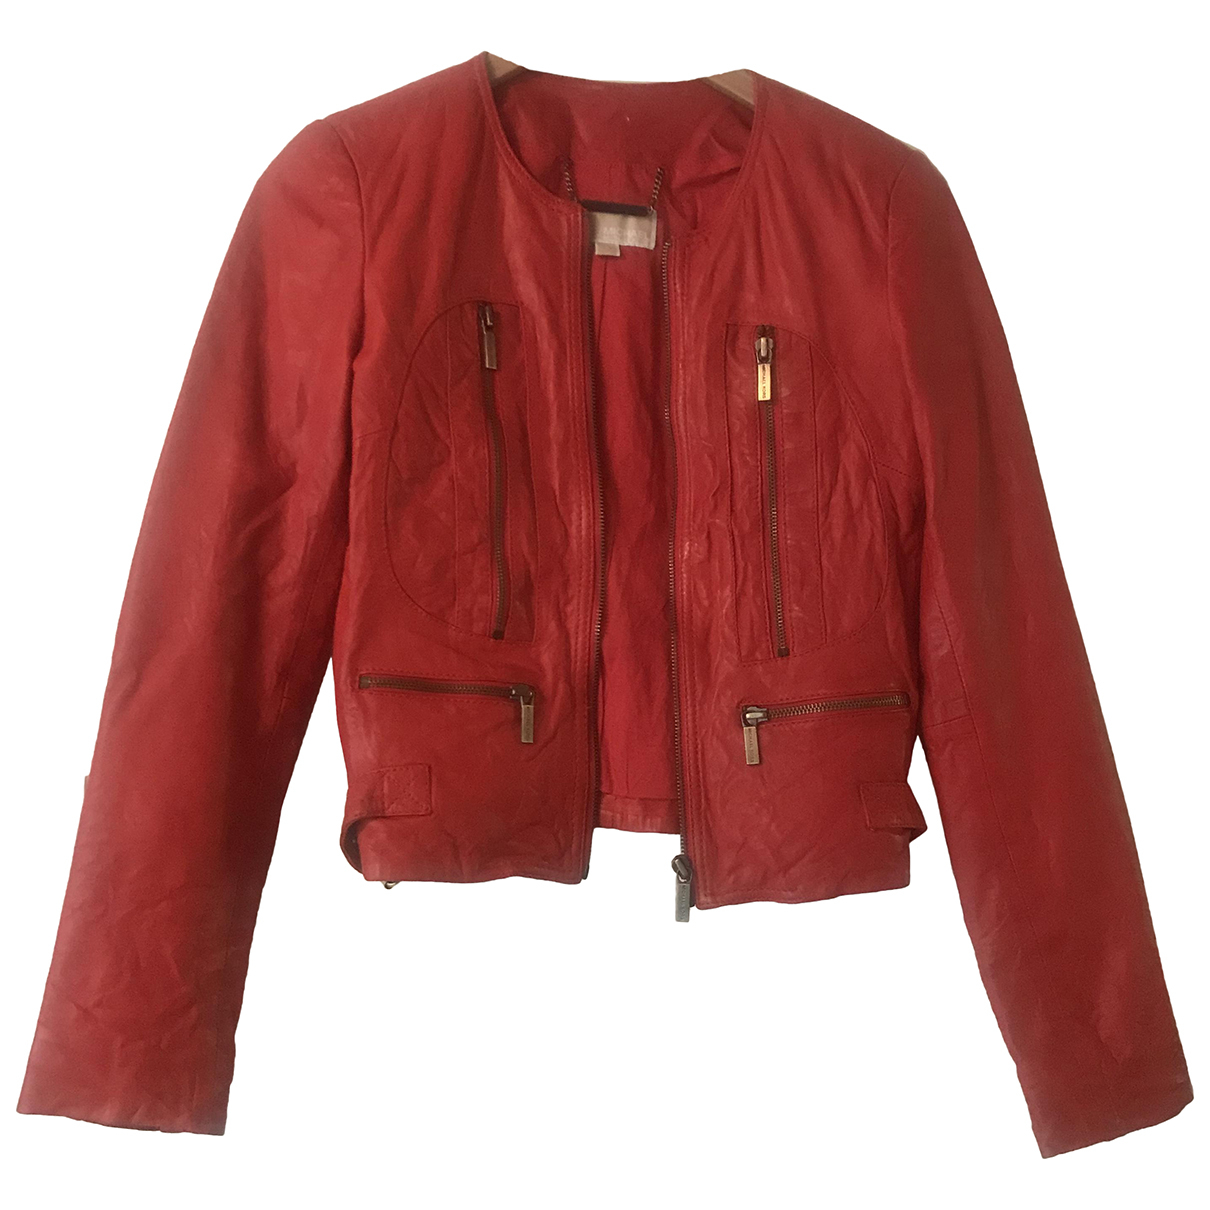 Michael Kors N Red Leather jacket for Women S International